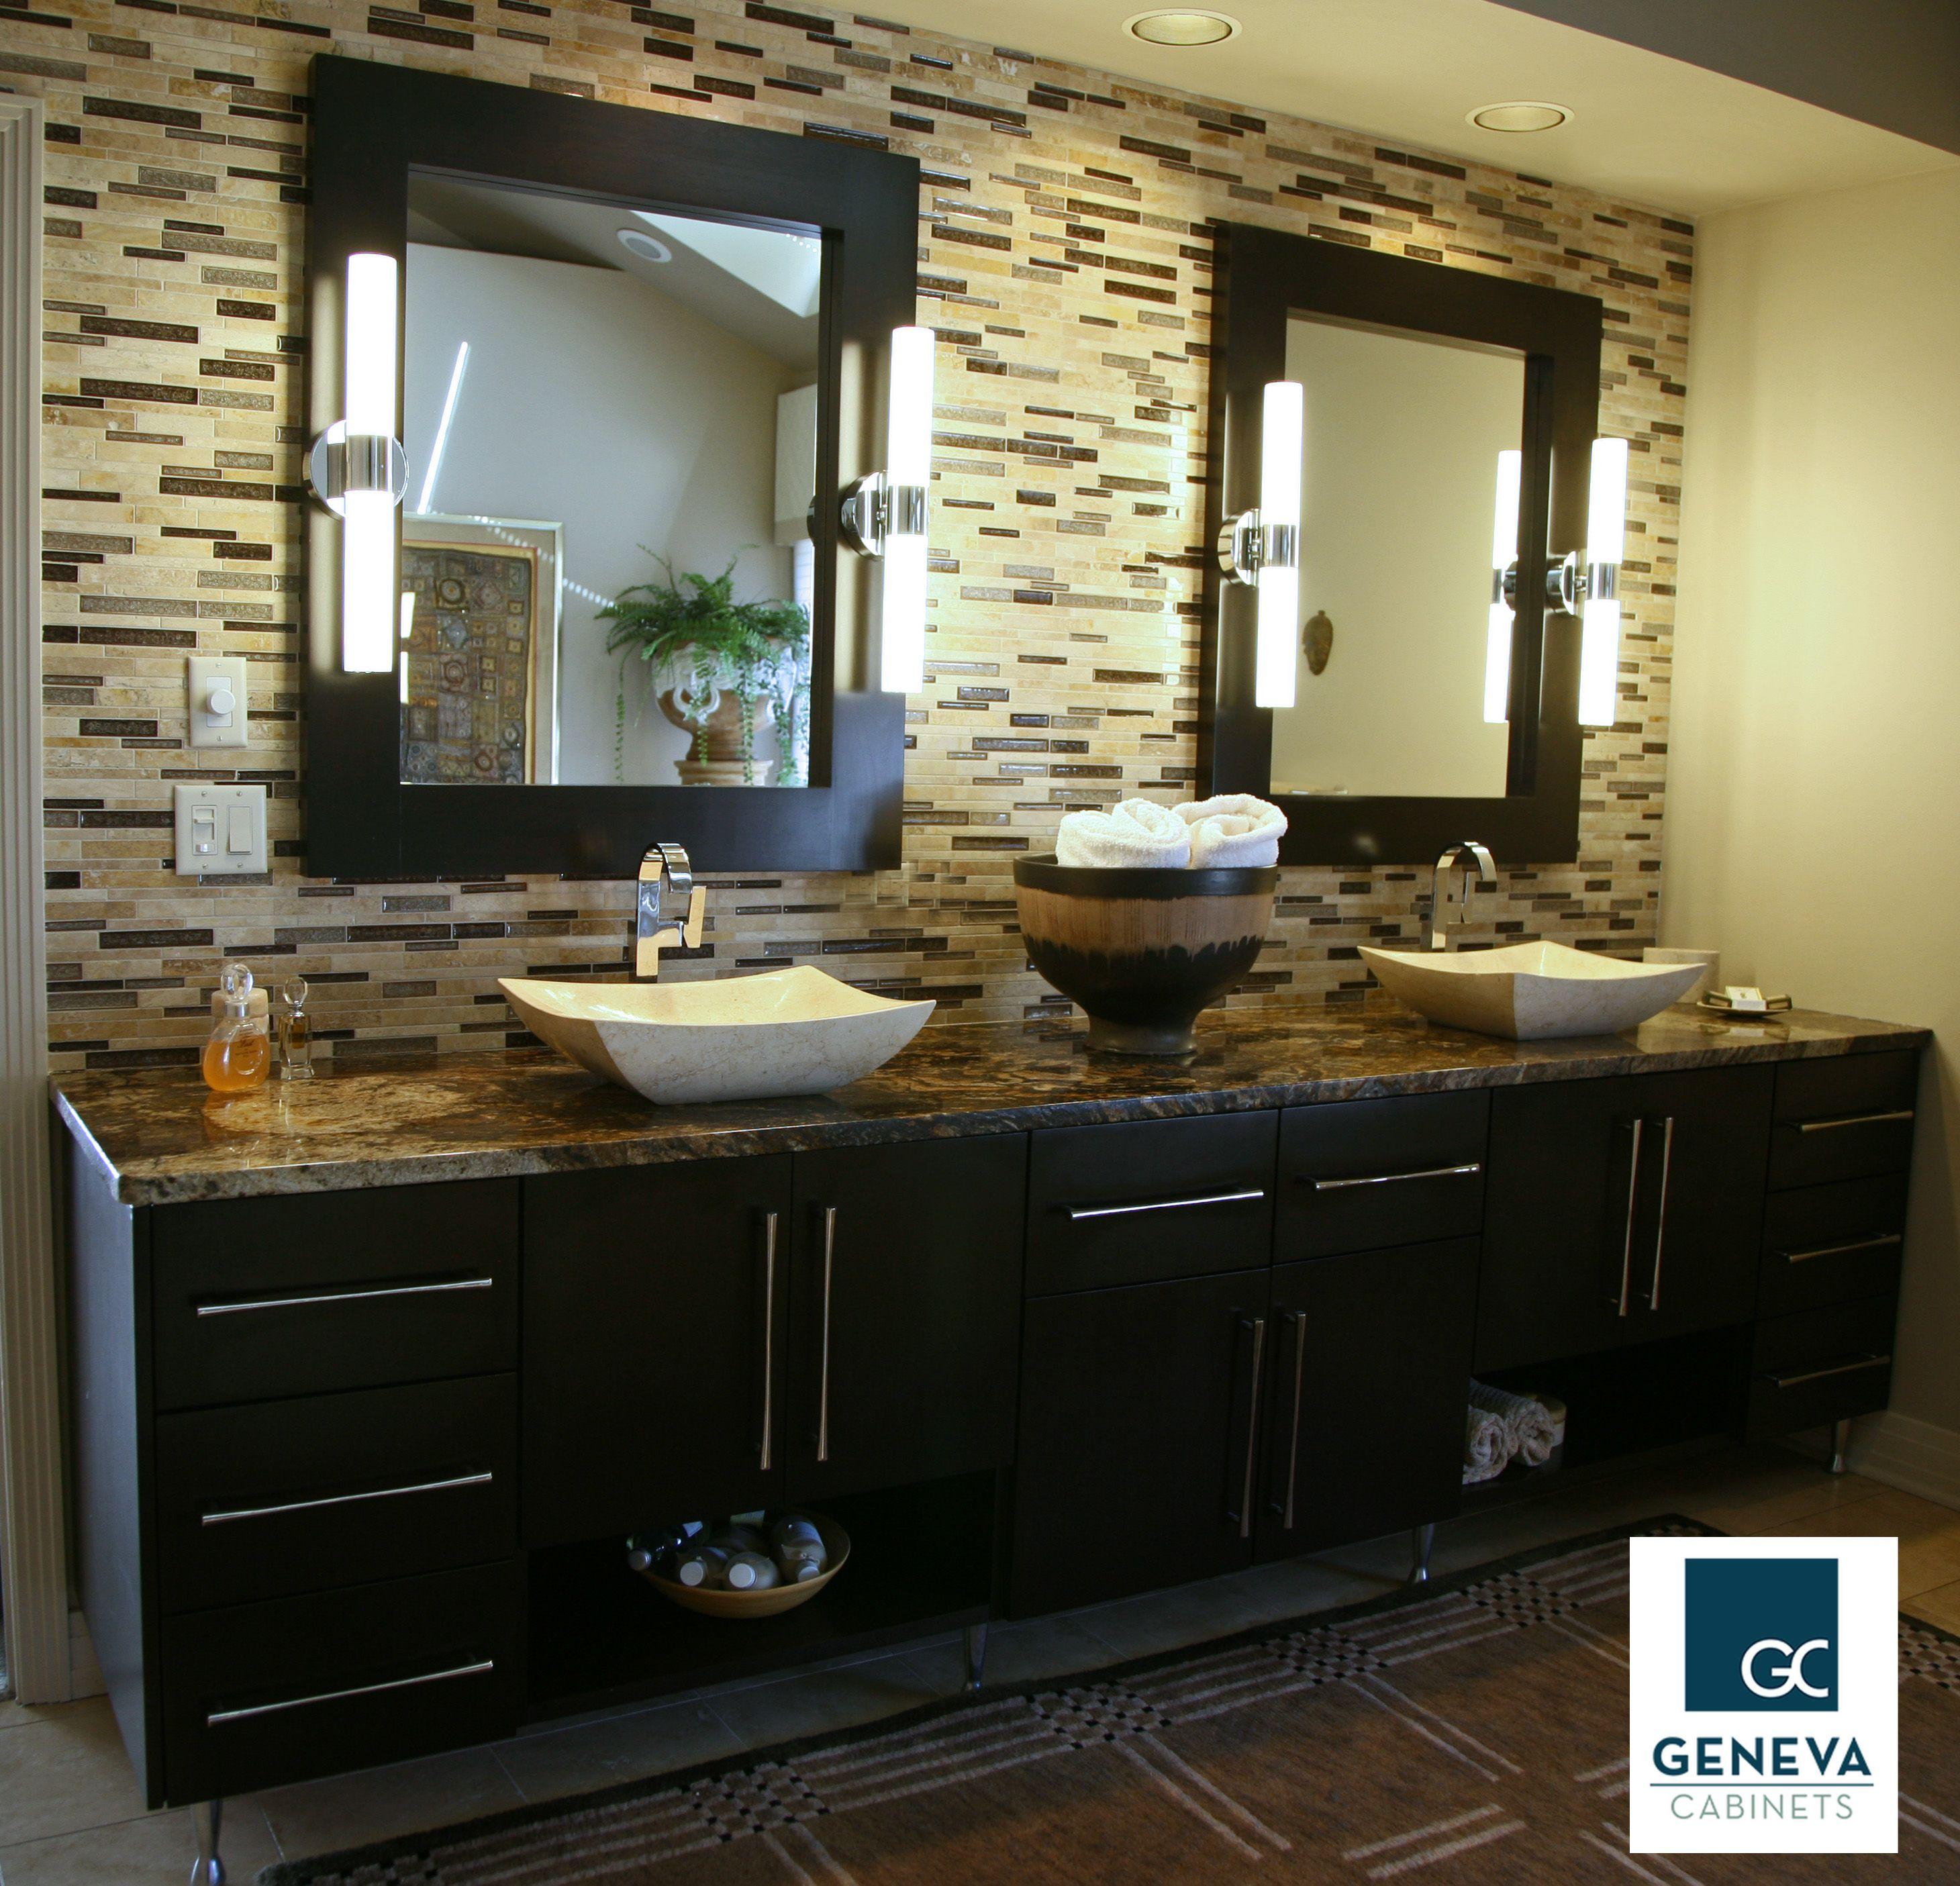 Bathroom Cabinets Company geneva cabinet company, lake geneva wi, designer peggy helgeson